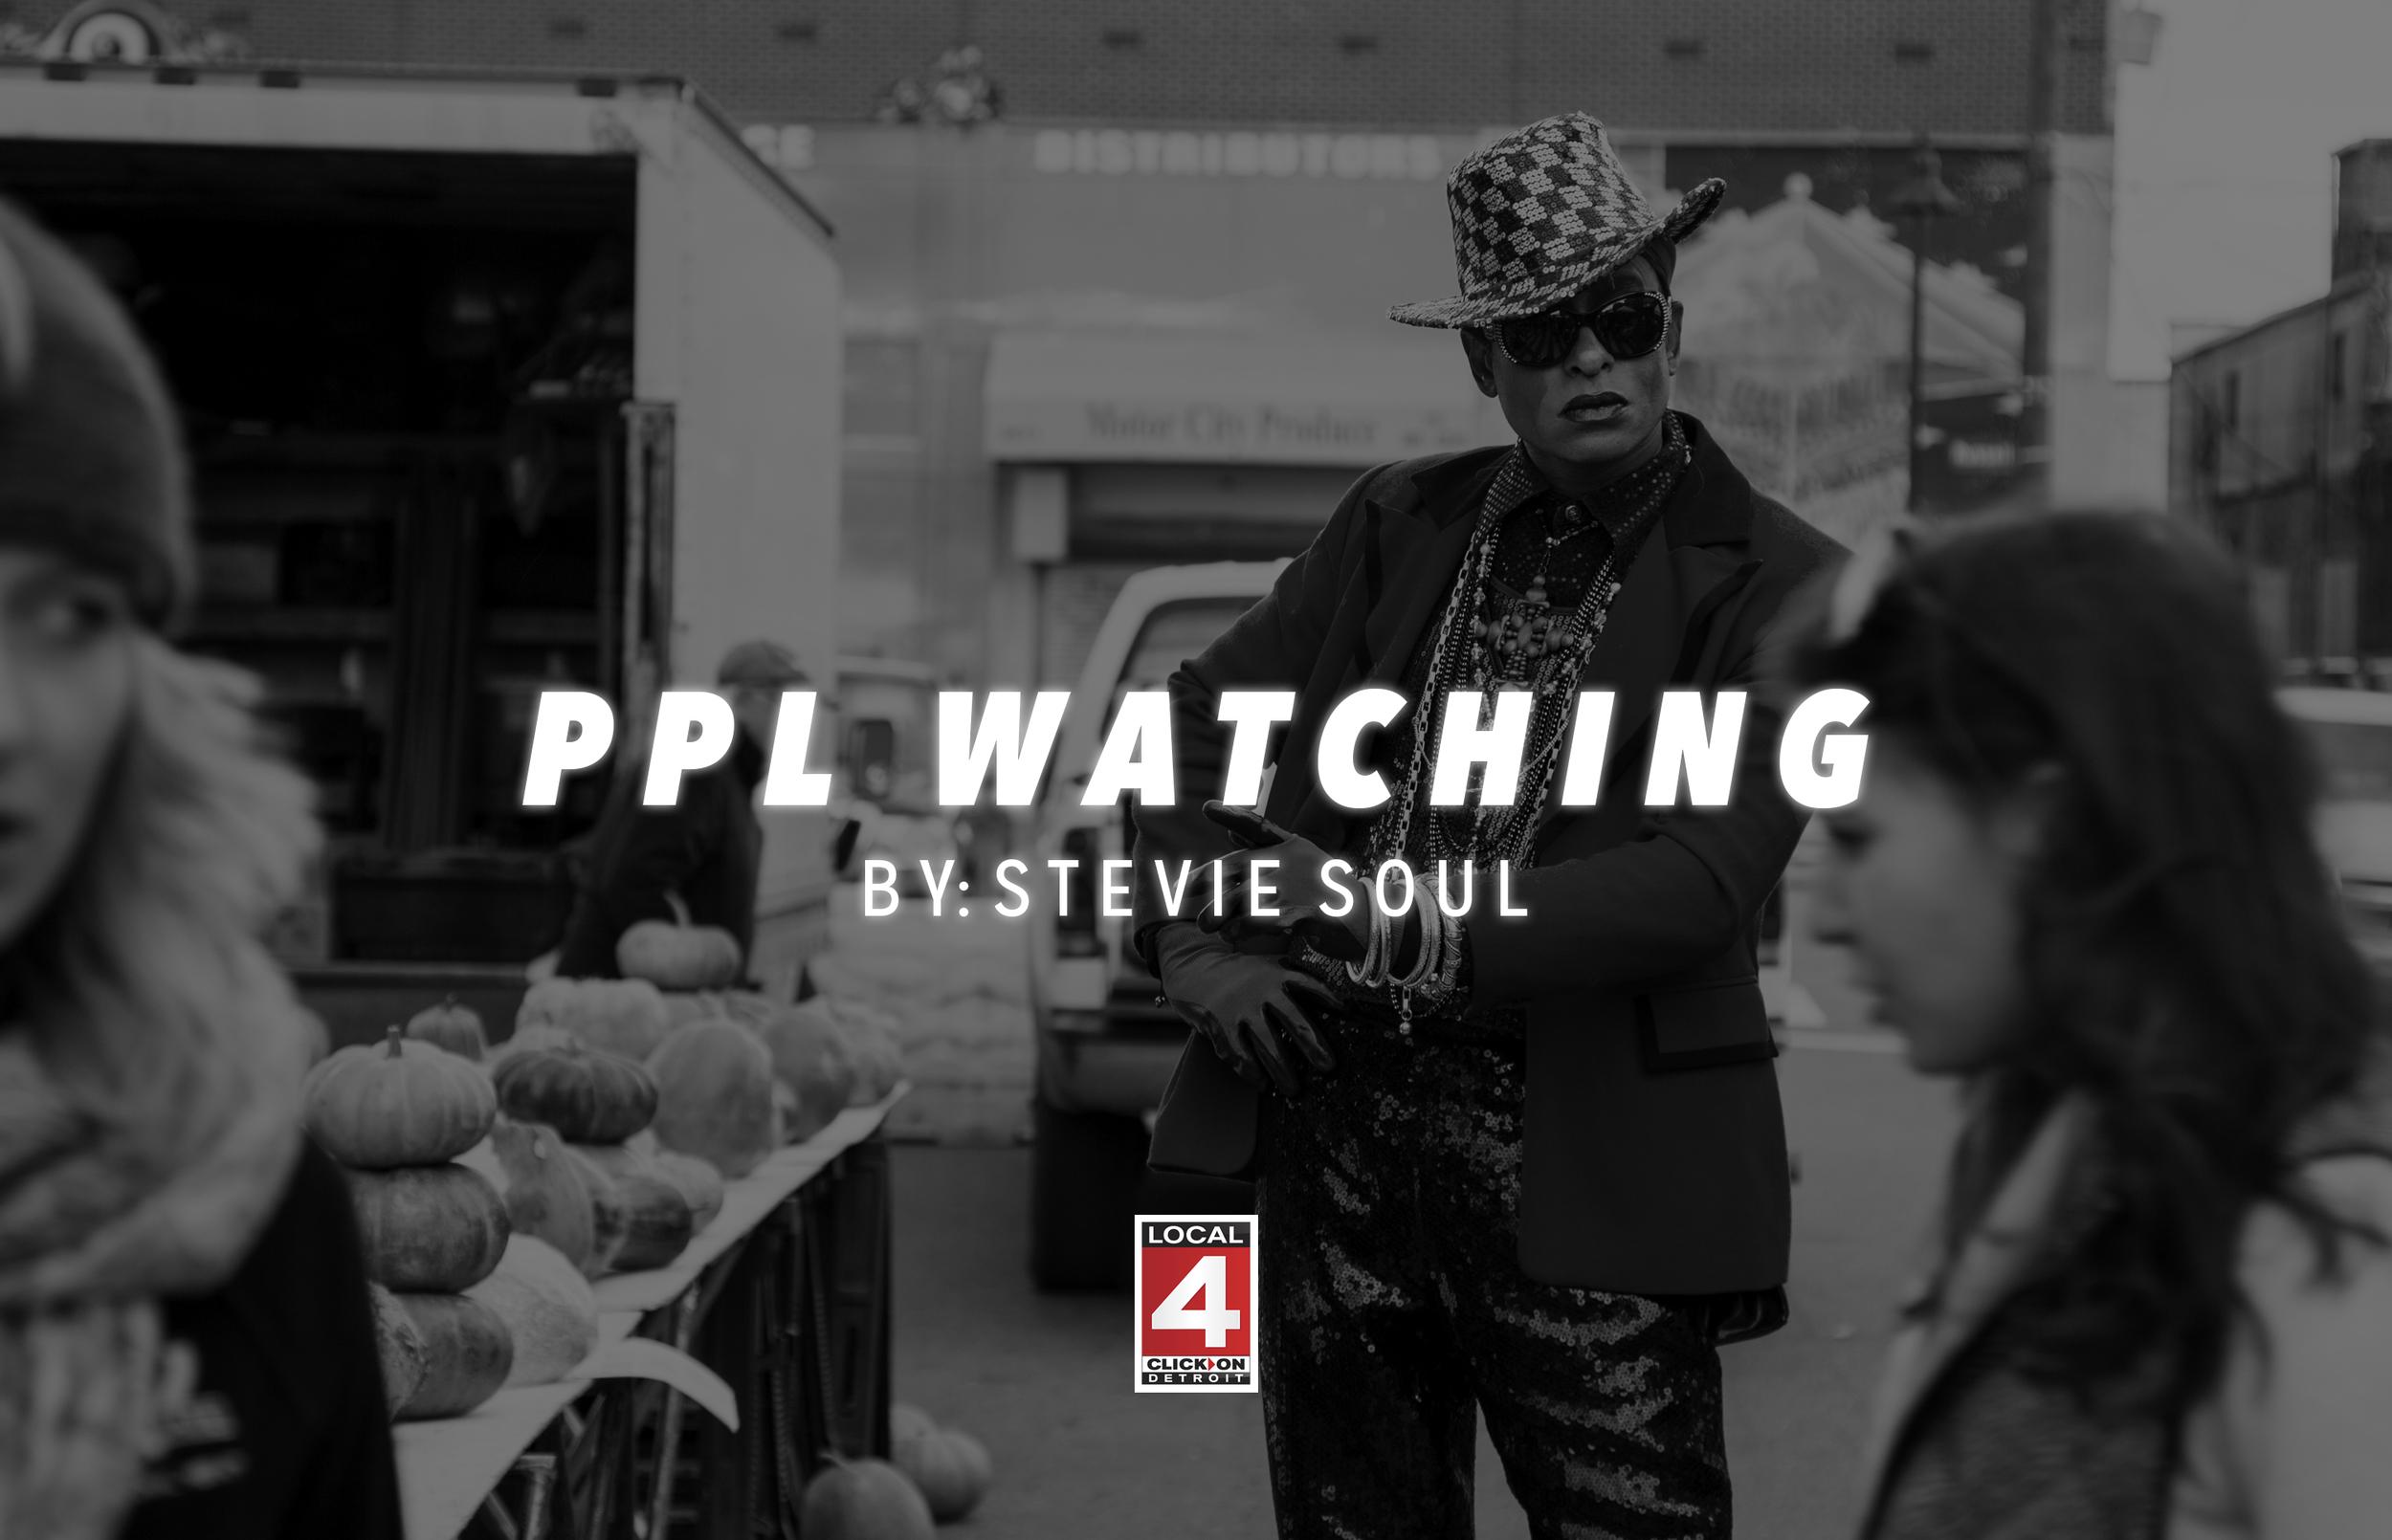 Stevie Soul PPL Watching Eastern Market Banner Local 4.jpg